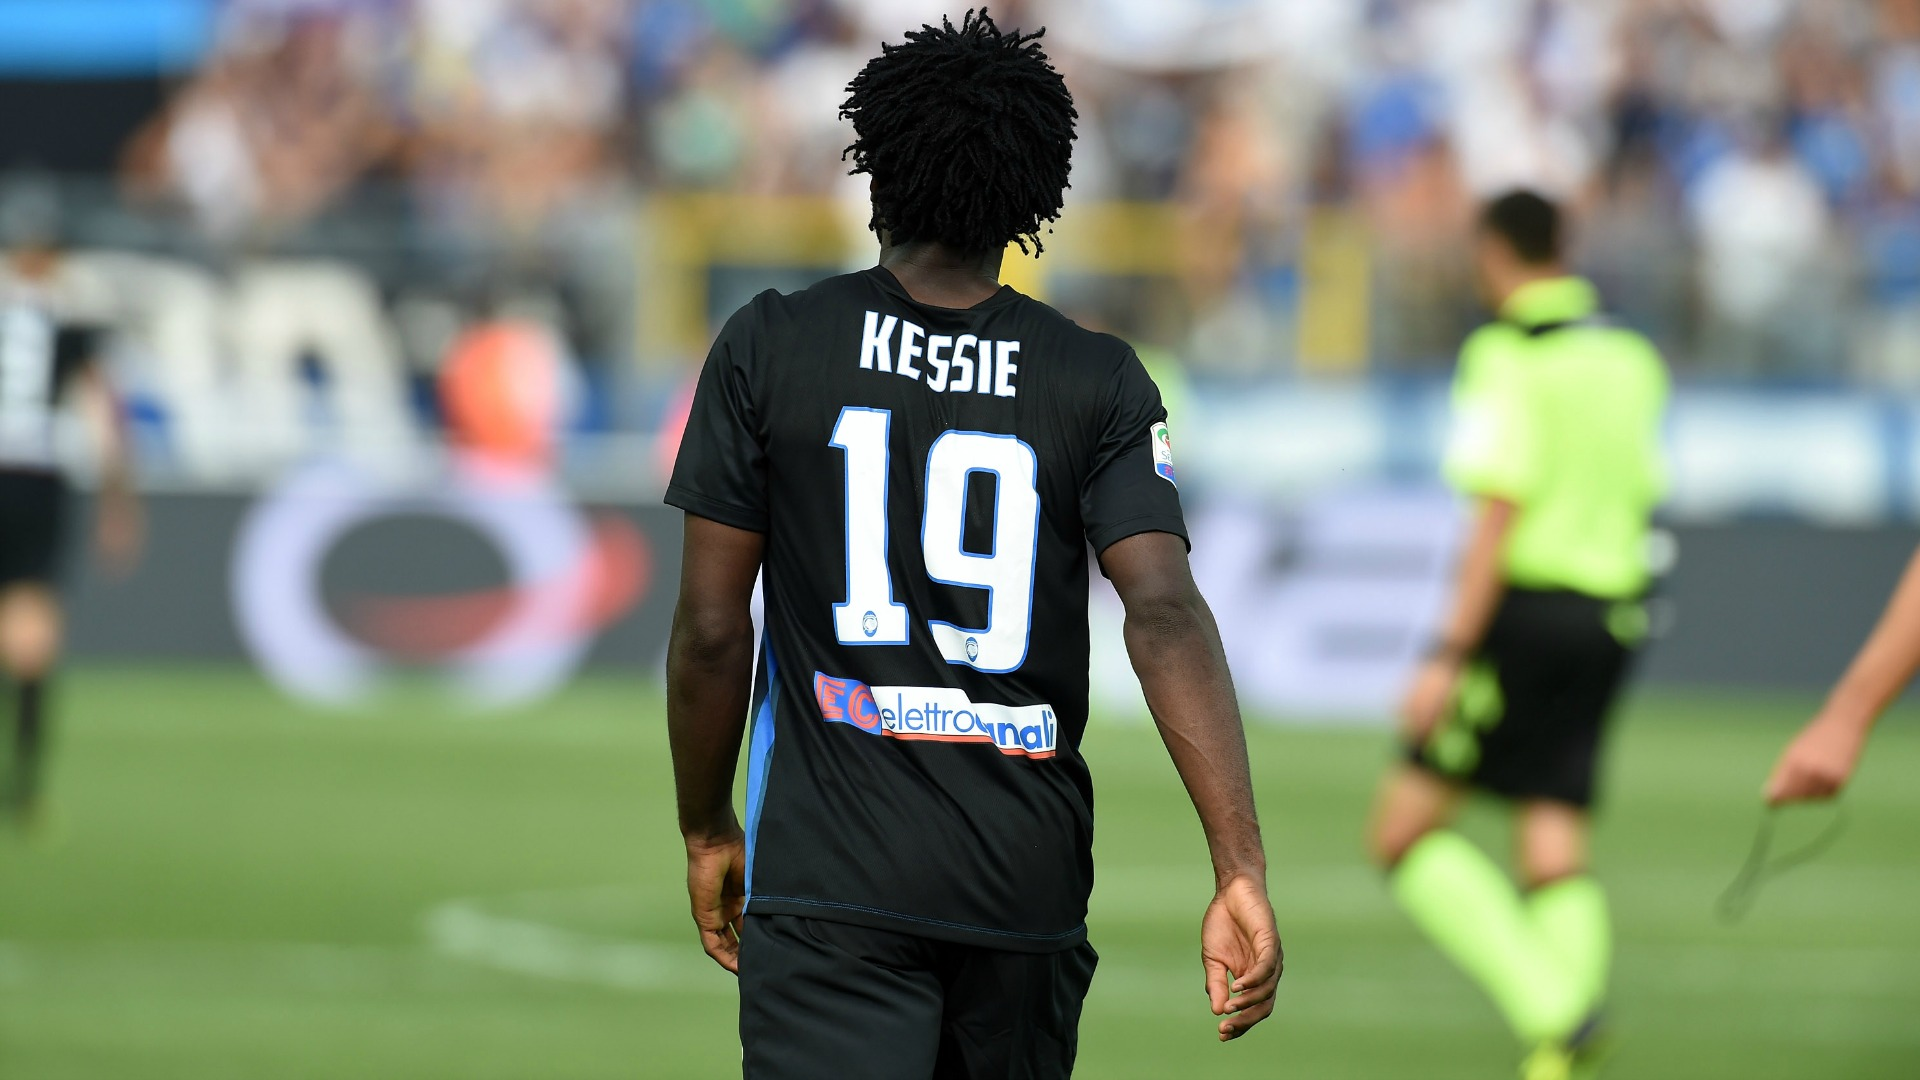 Calciomercato Juventus, Marotta vuole Kessie. Pronti 10 milioni?